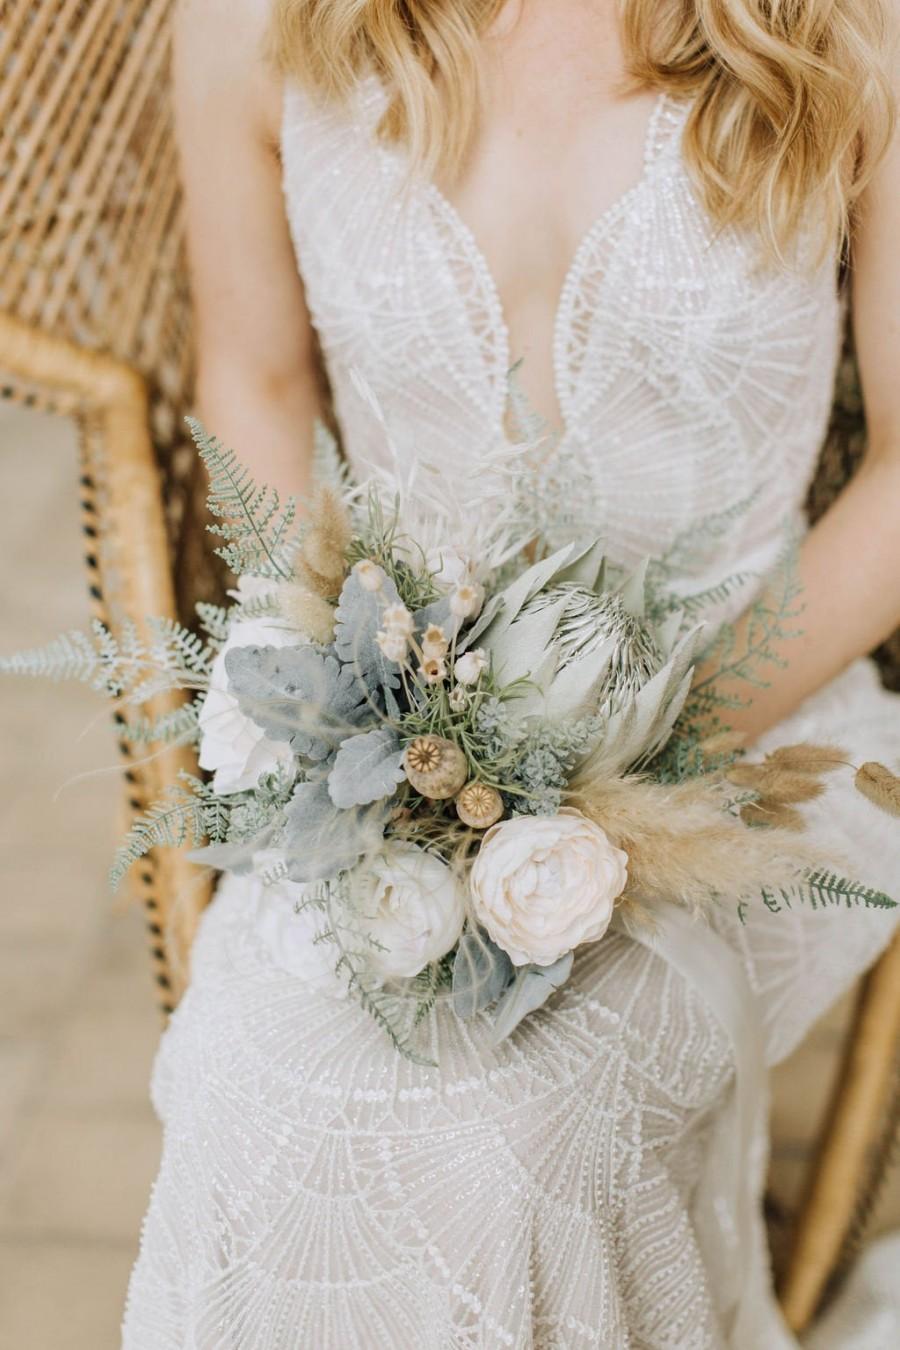 Wedding - Foliage bouquet, greenery bouquet, rustic flowers, protea bouquet, keepsake bouquet, forest wedding, woodland wedding